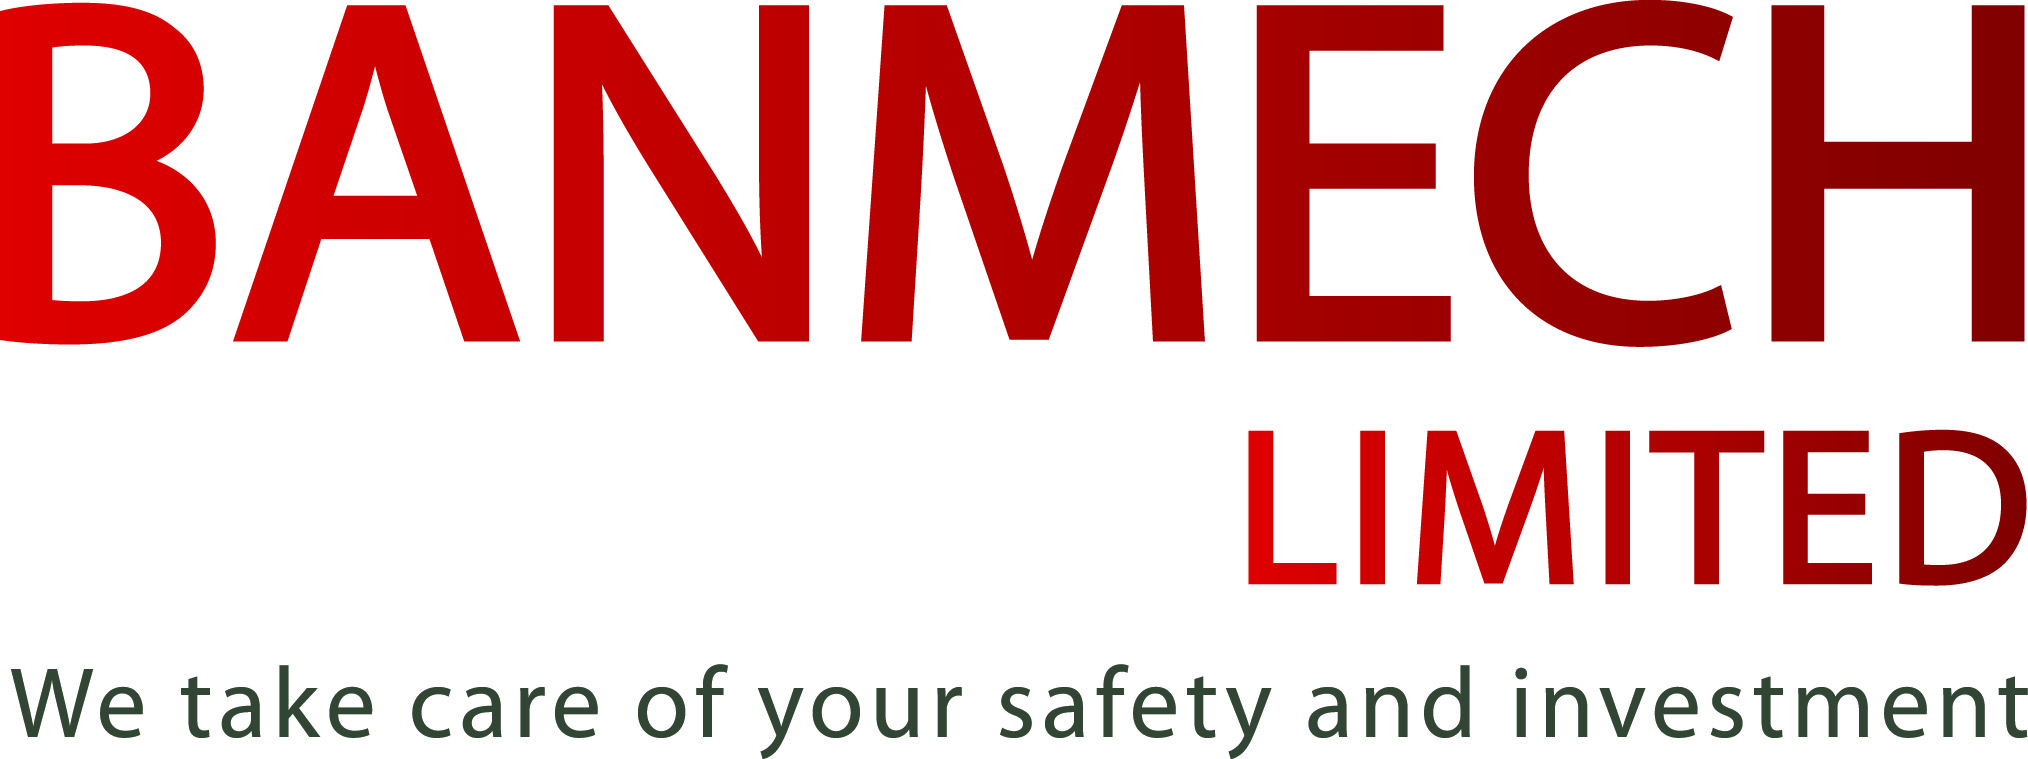 BANMECH LIMITED Logo